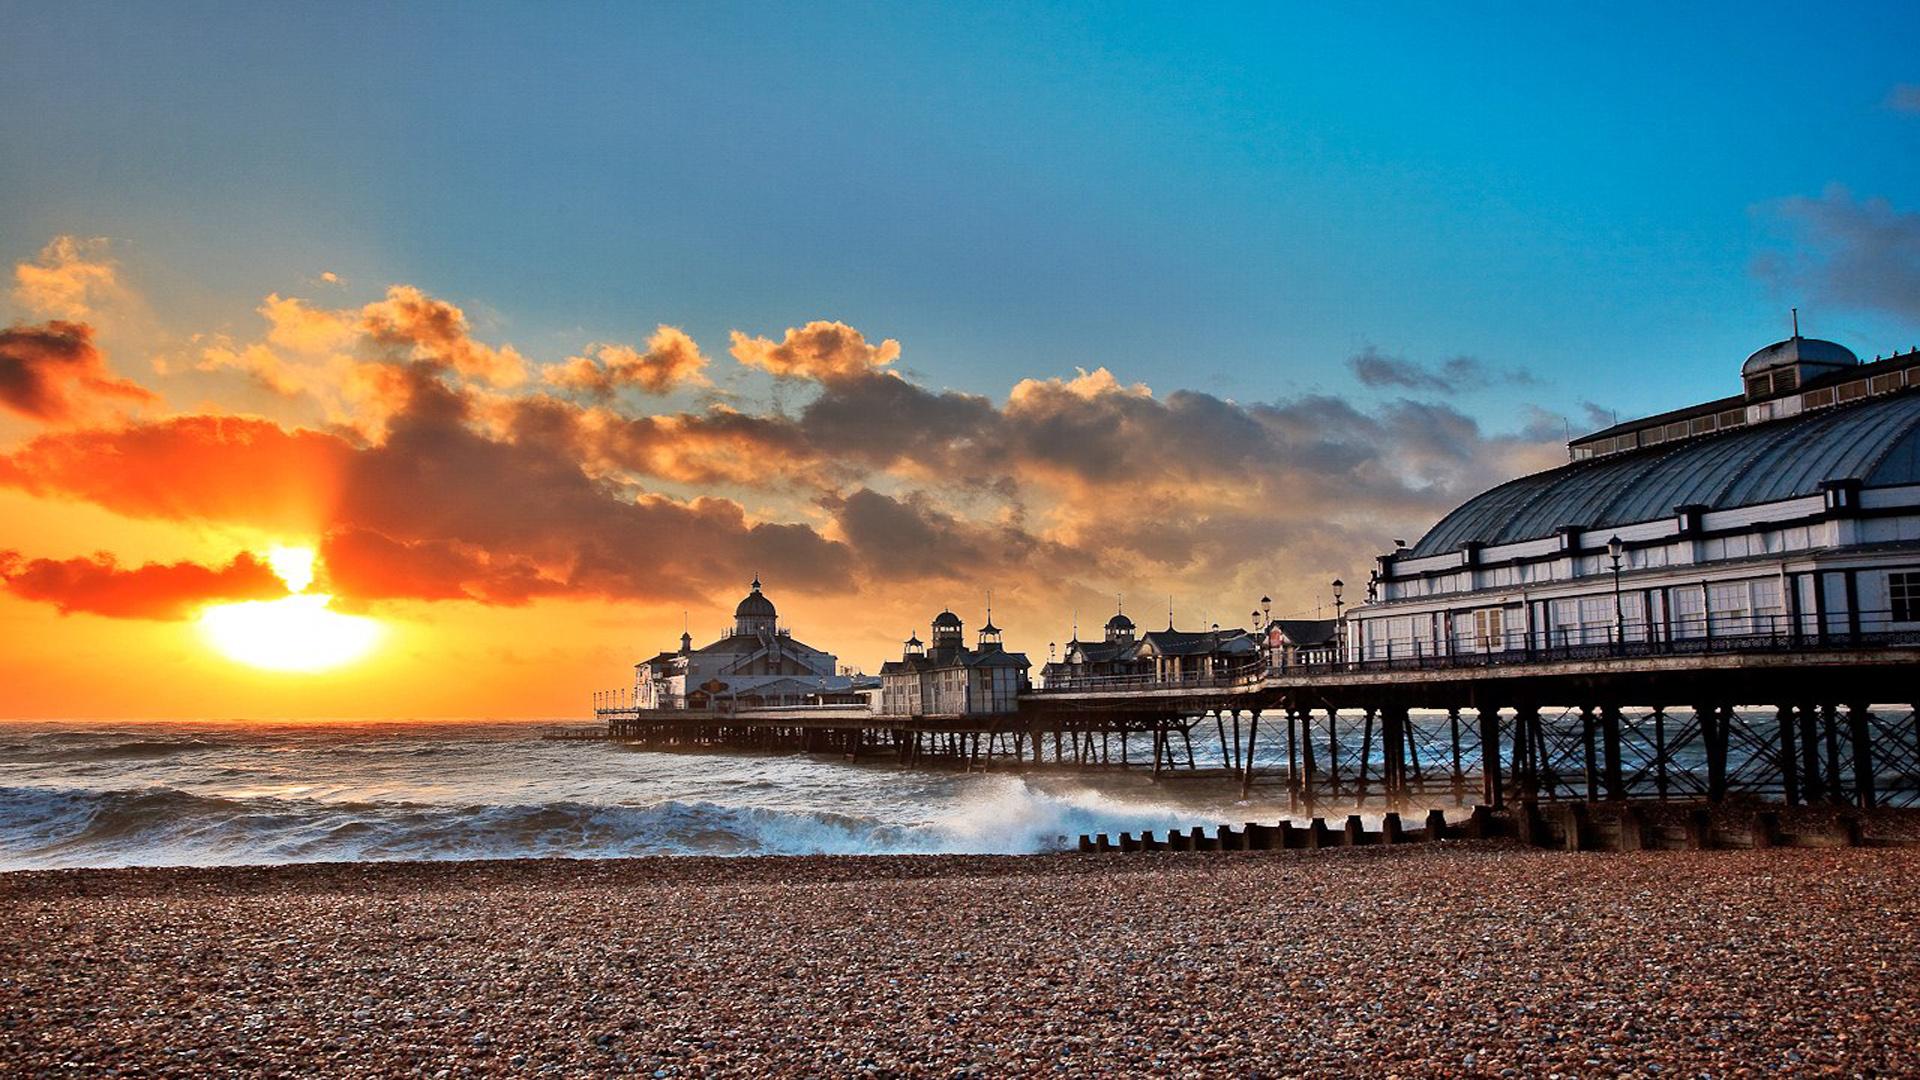 eastbourne-pier-sunset